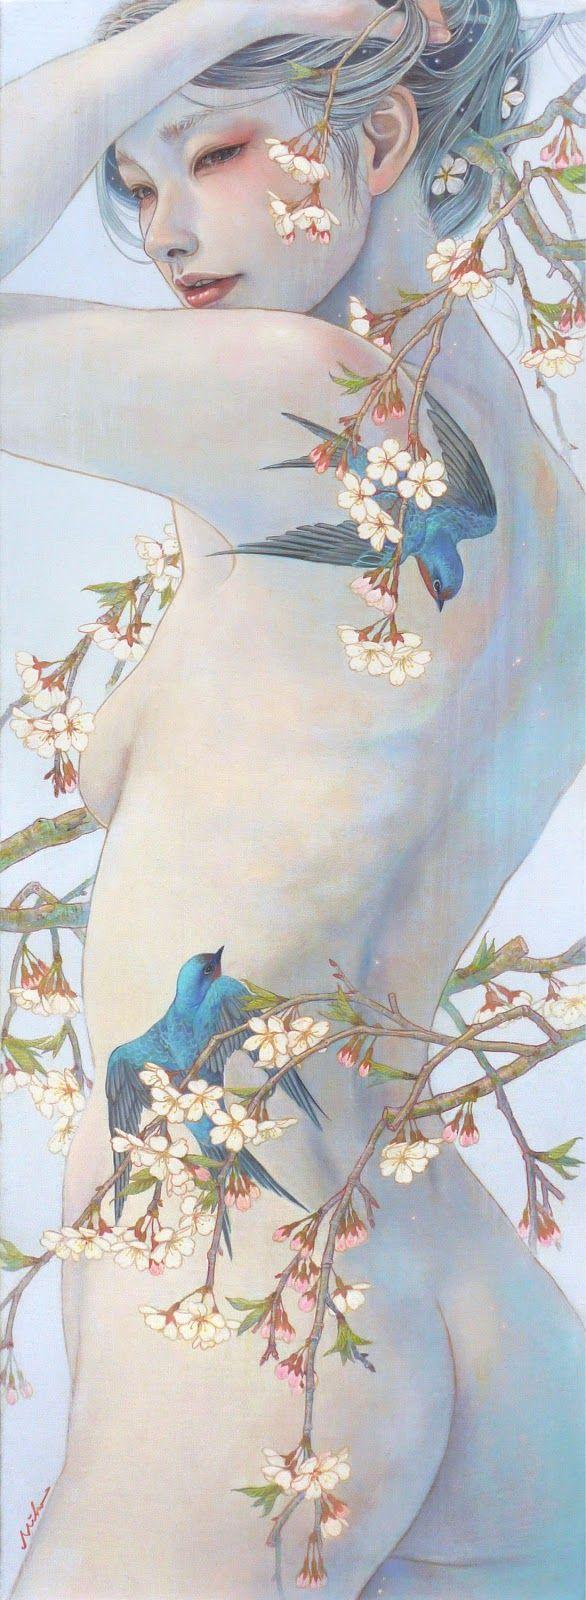 Miho Hirano / 平野 実 穂   Arte pop de la fantasía   Tutt'Art @   Pittura * Scultura * * Poesia Musica  